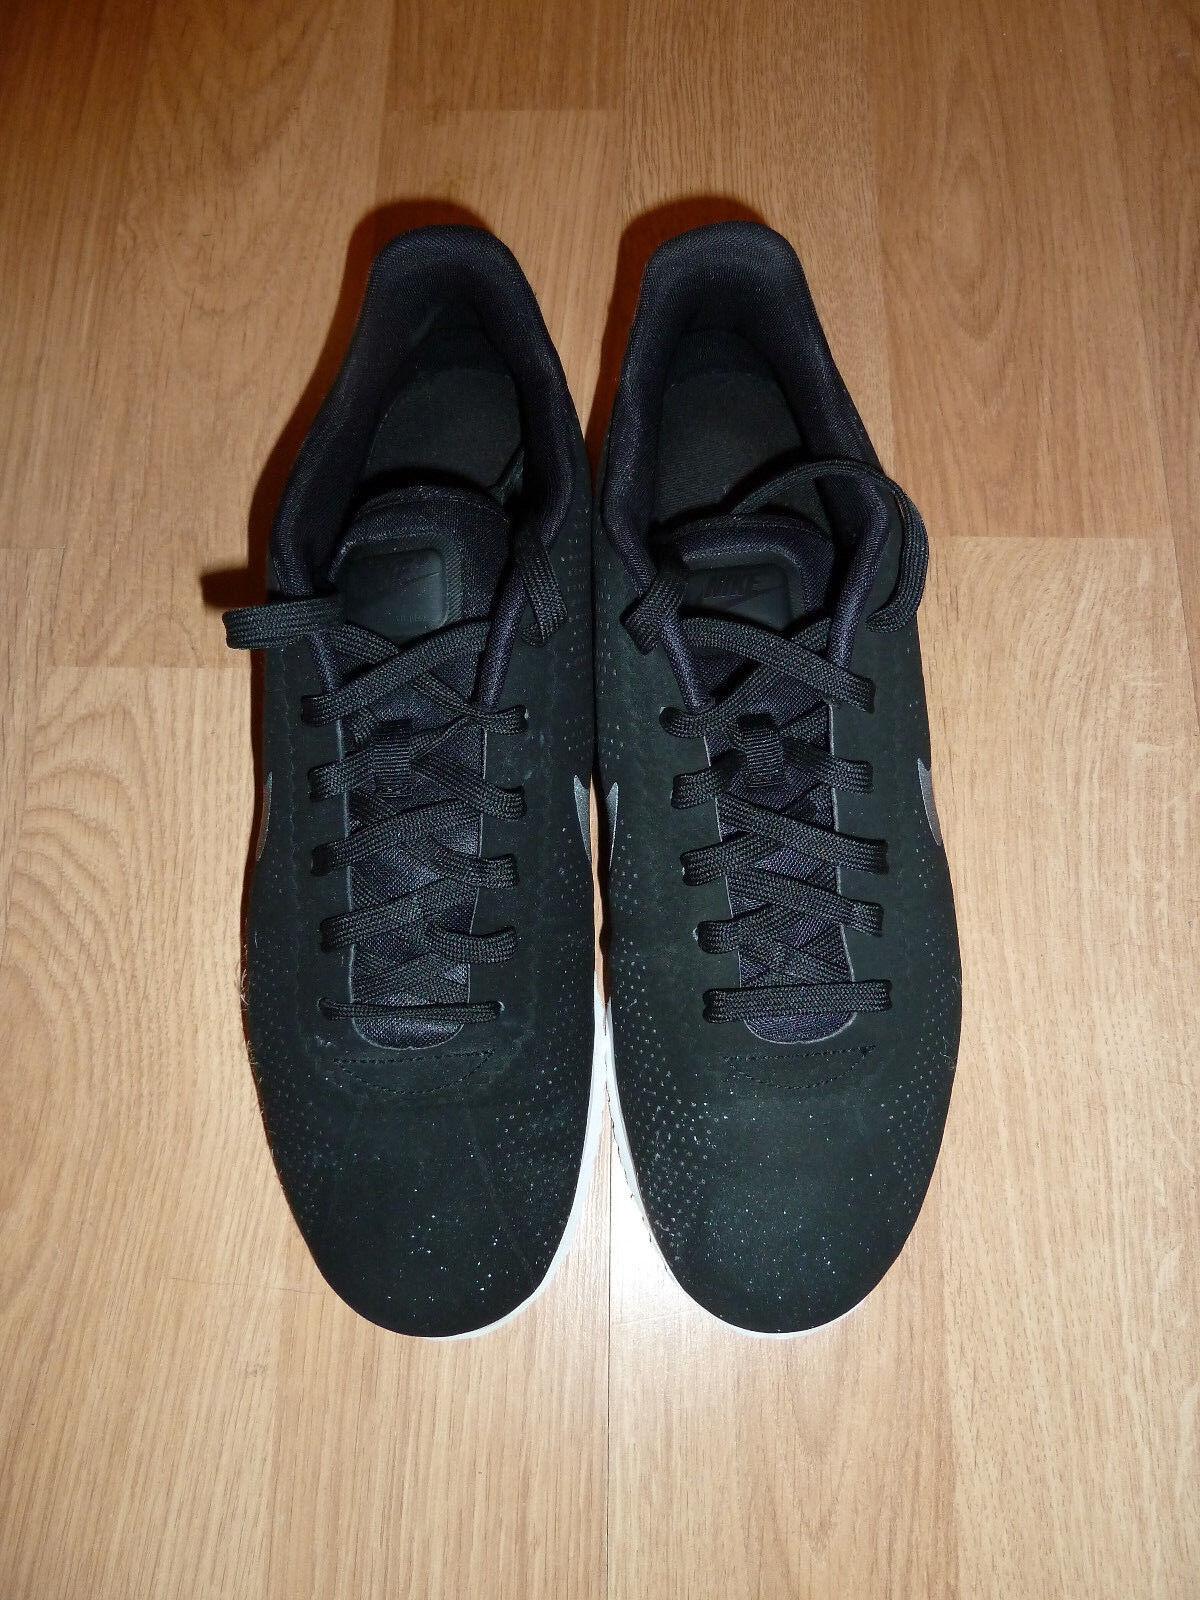 Nike Cortez Ultra Moire Black Black-White 845013-001 Sneaker US Men's Size 12